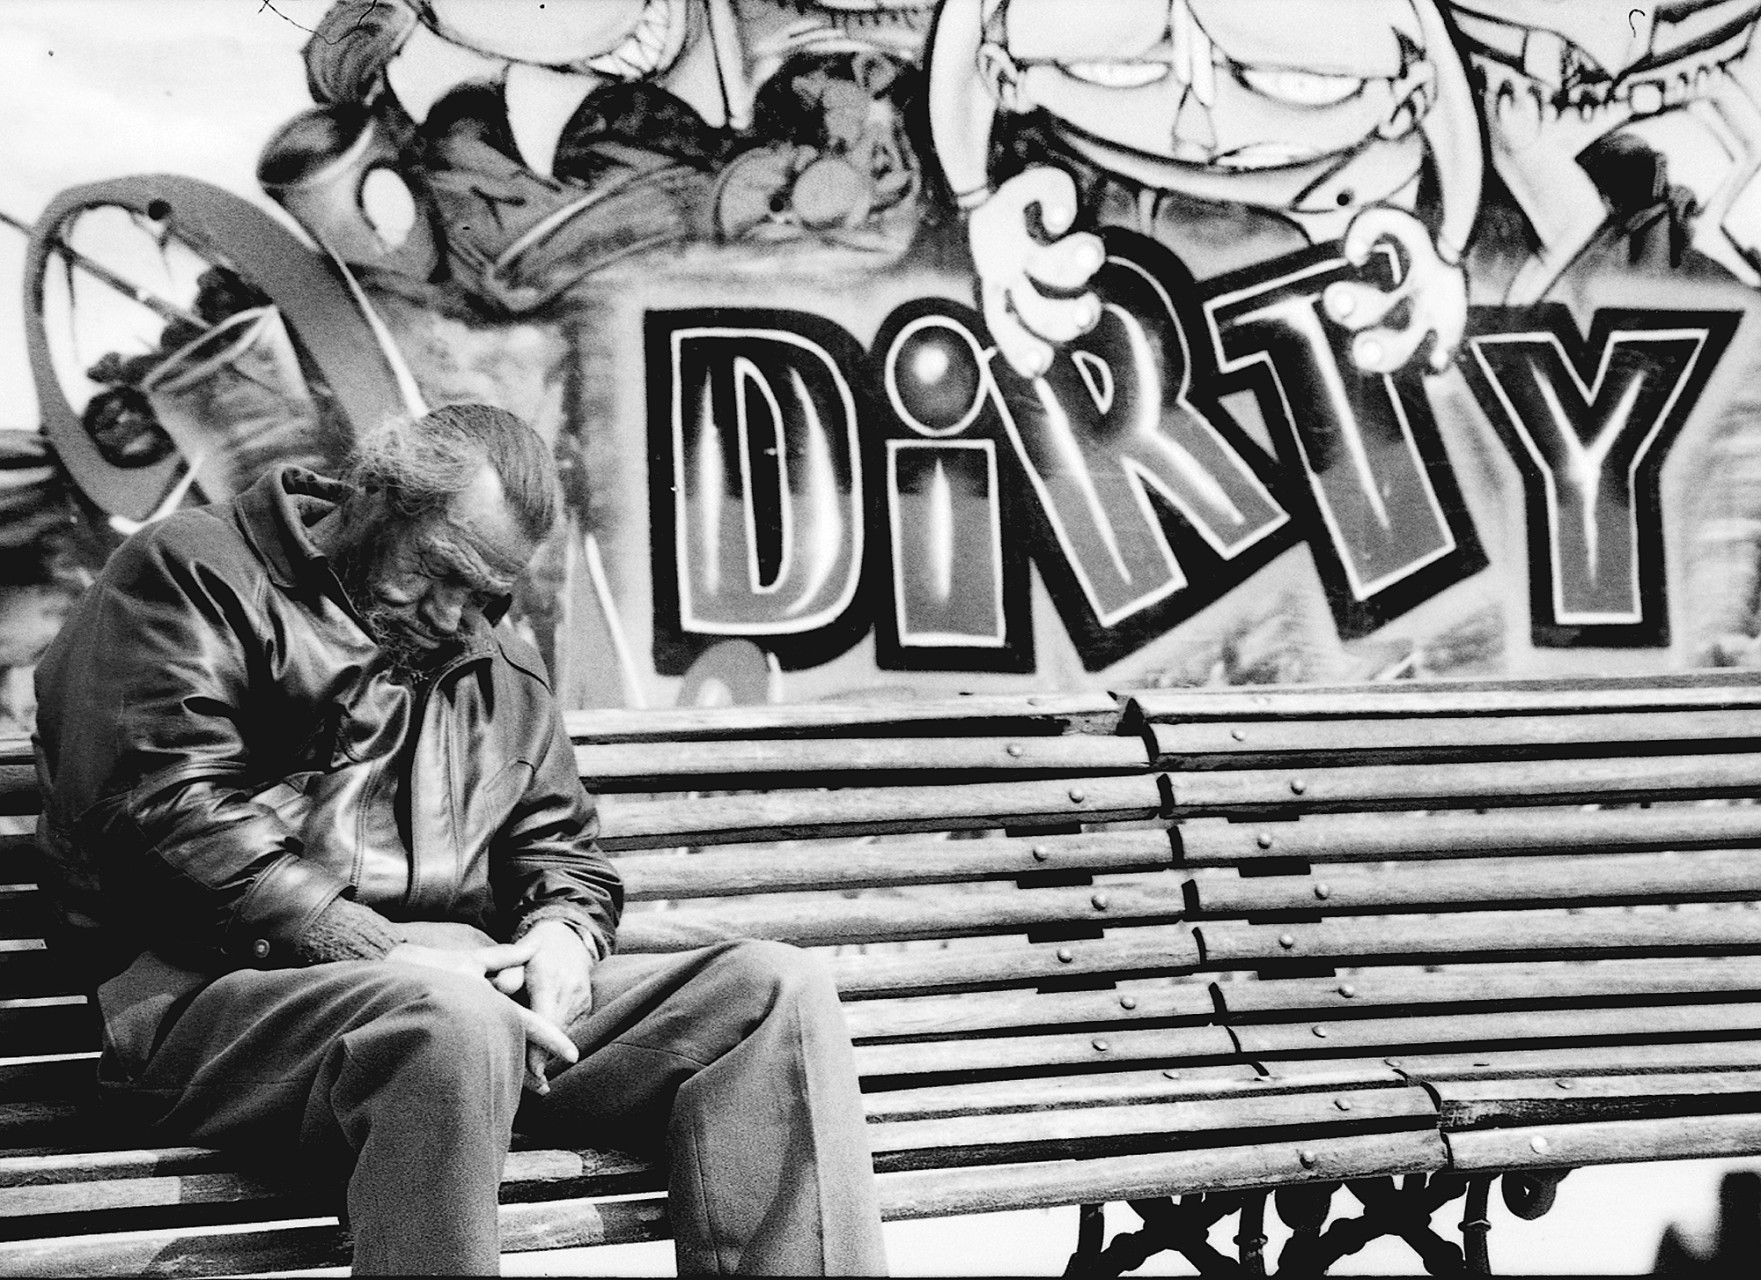 DIRTY-JUANMI-MARQUEZ